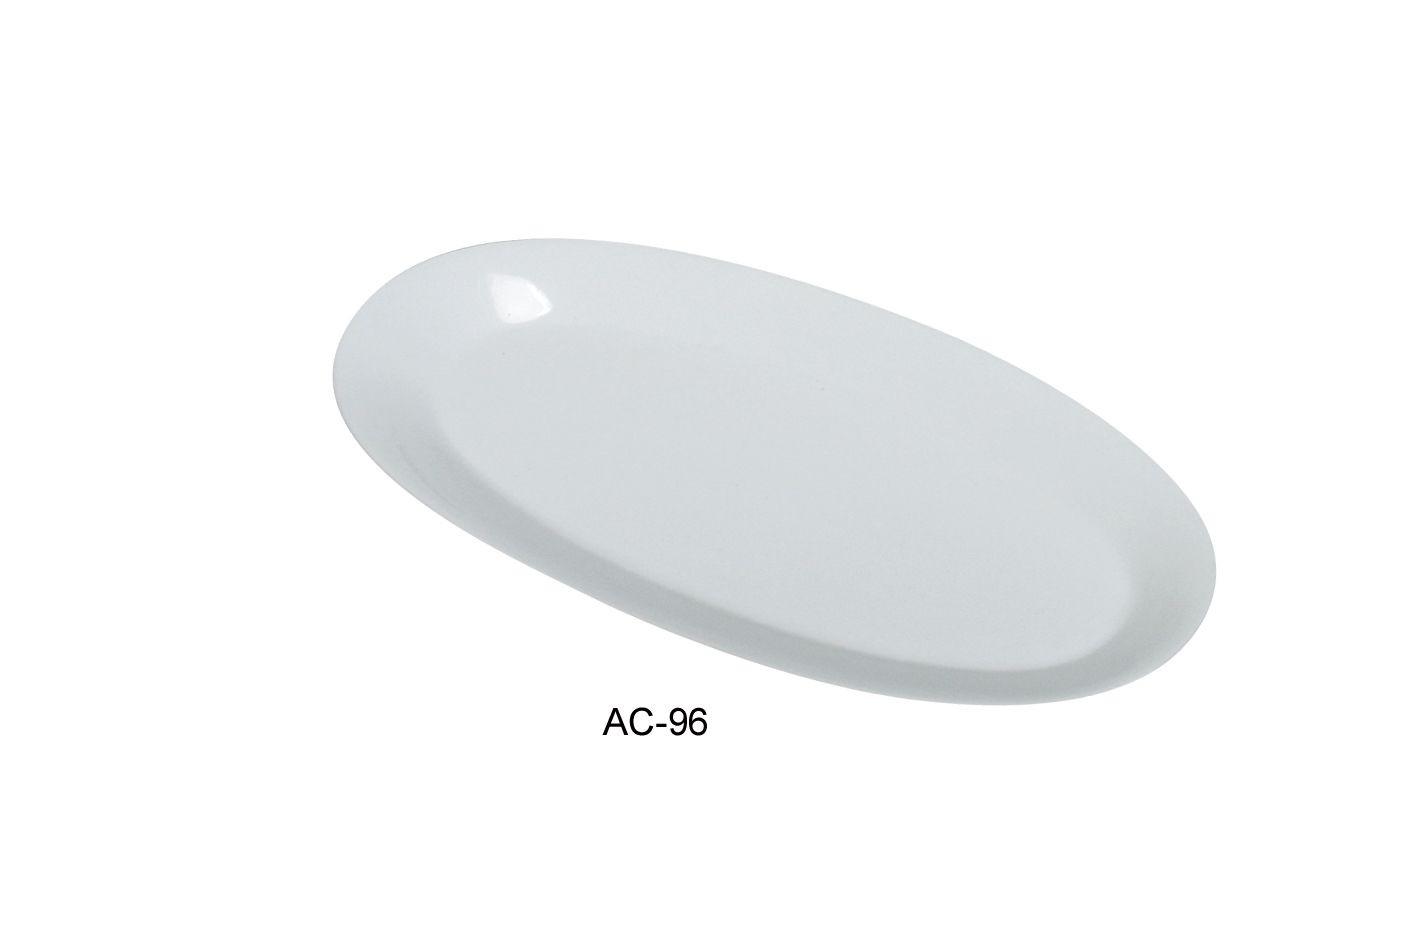 "Yanco AC-96 Abco 16"" x 7 3/4"" x 1 1/4"" Fishia Platter"